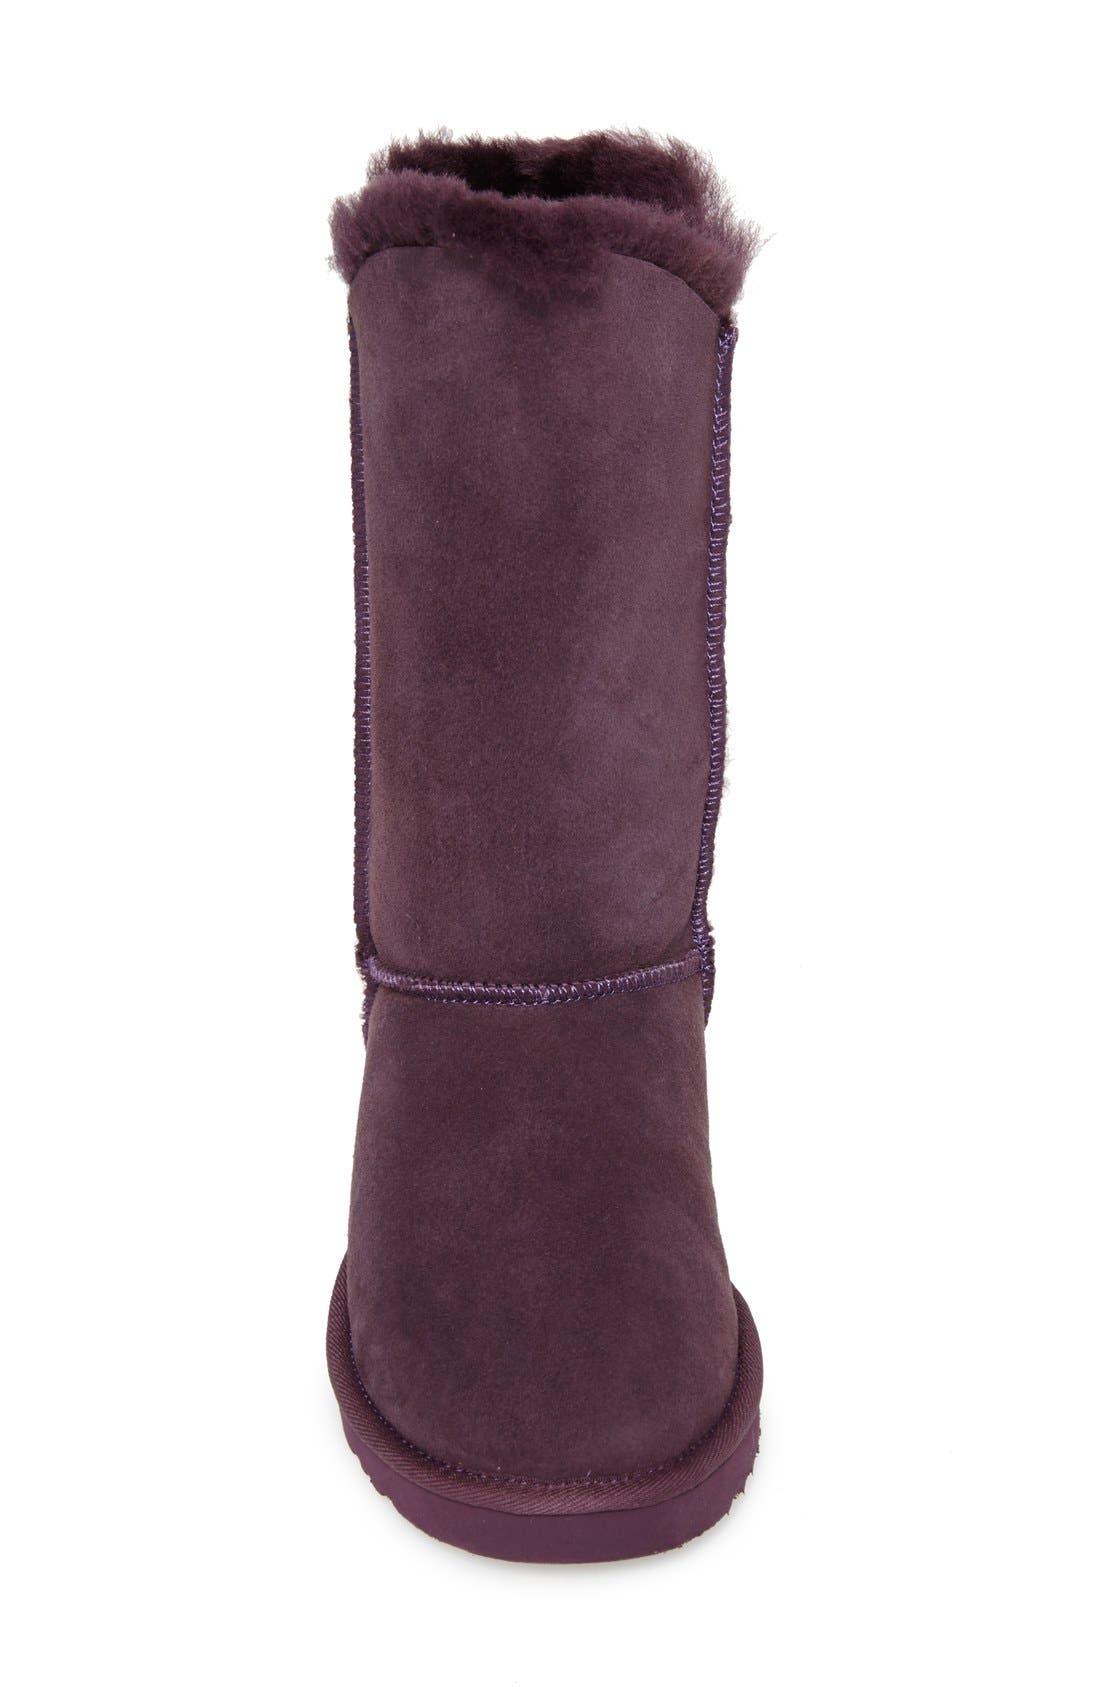 Alternate Image 3  - Koolaburra 'Double Halo' Genuine Shearling Boot (Women)